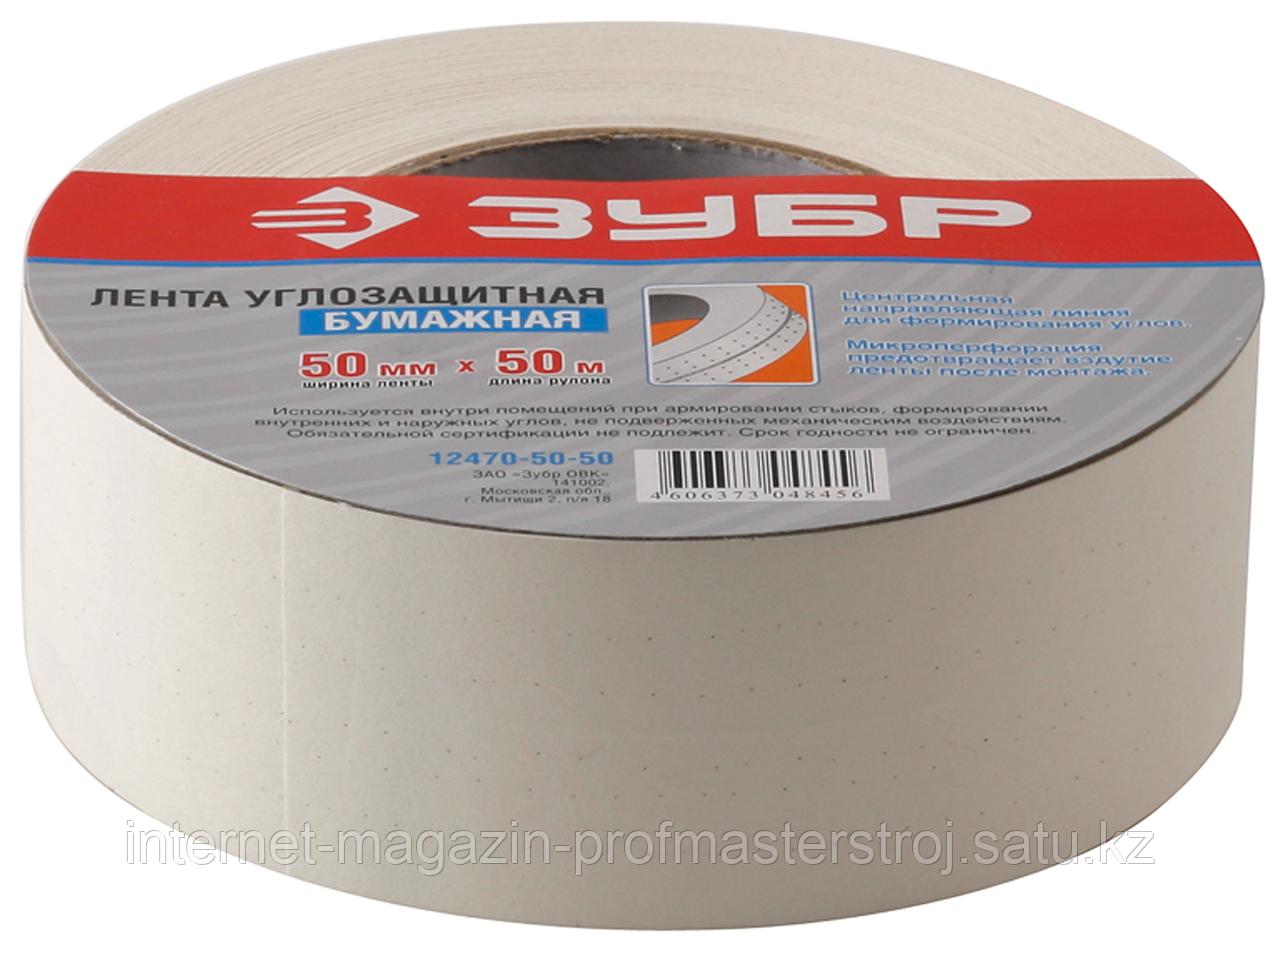 Лента углозащитная бумажная, 50 мм x 50 м, серия «МАСТЕР», ЗУБР